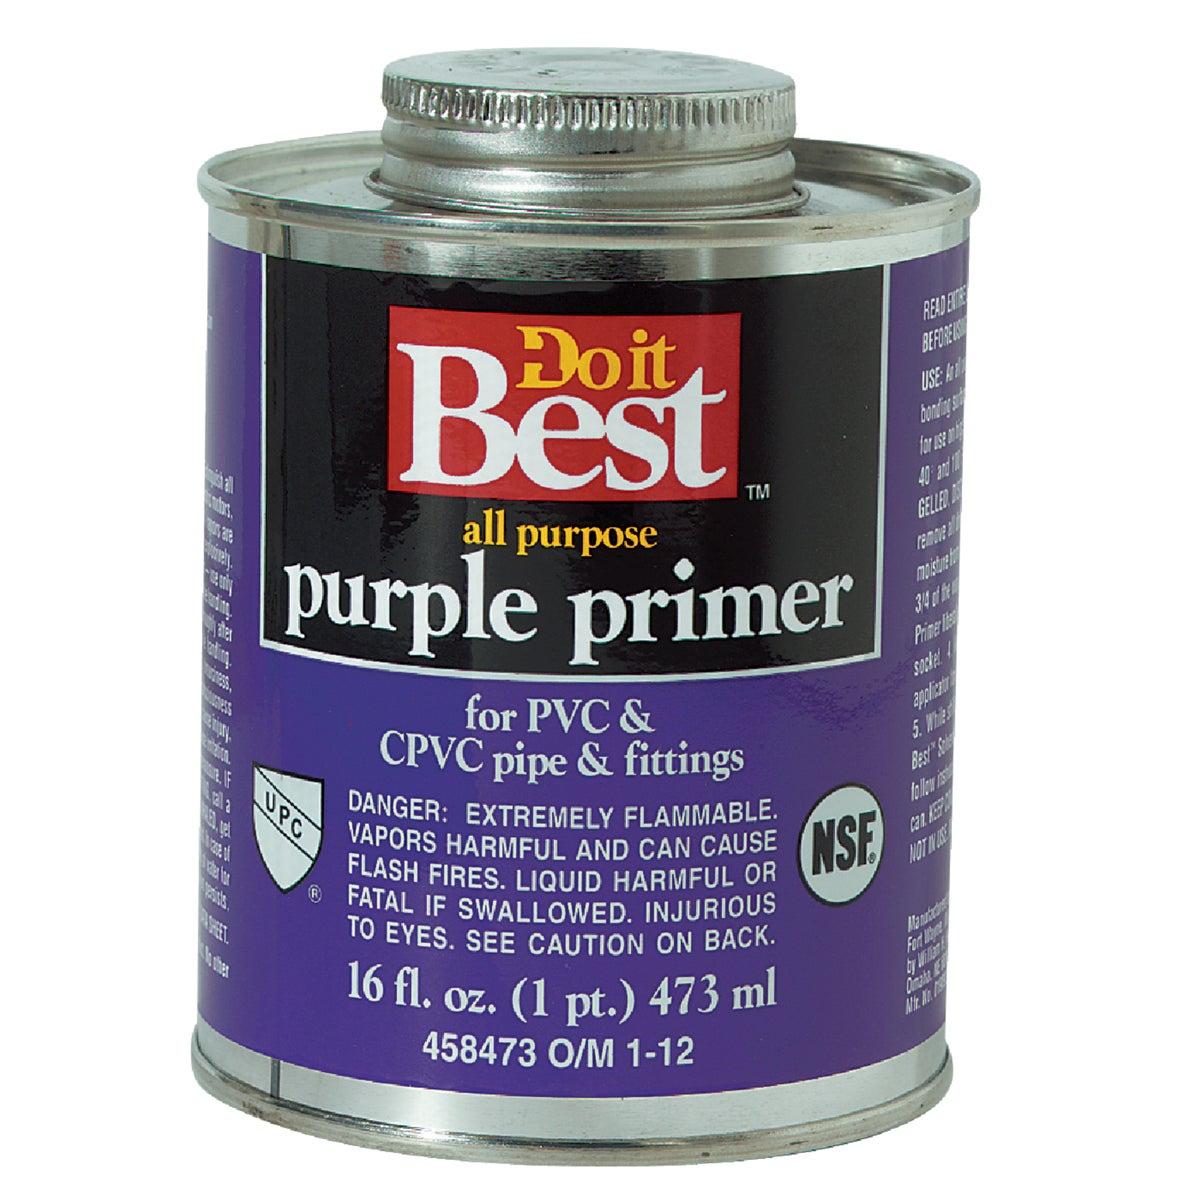 PINT PURPLE PRIMER - 019092 by Wm H Harvey Co